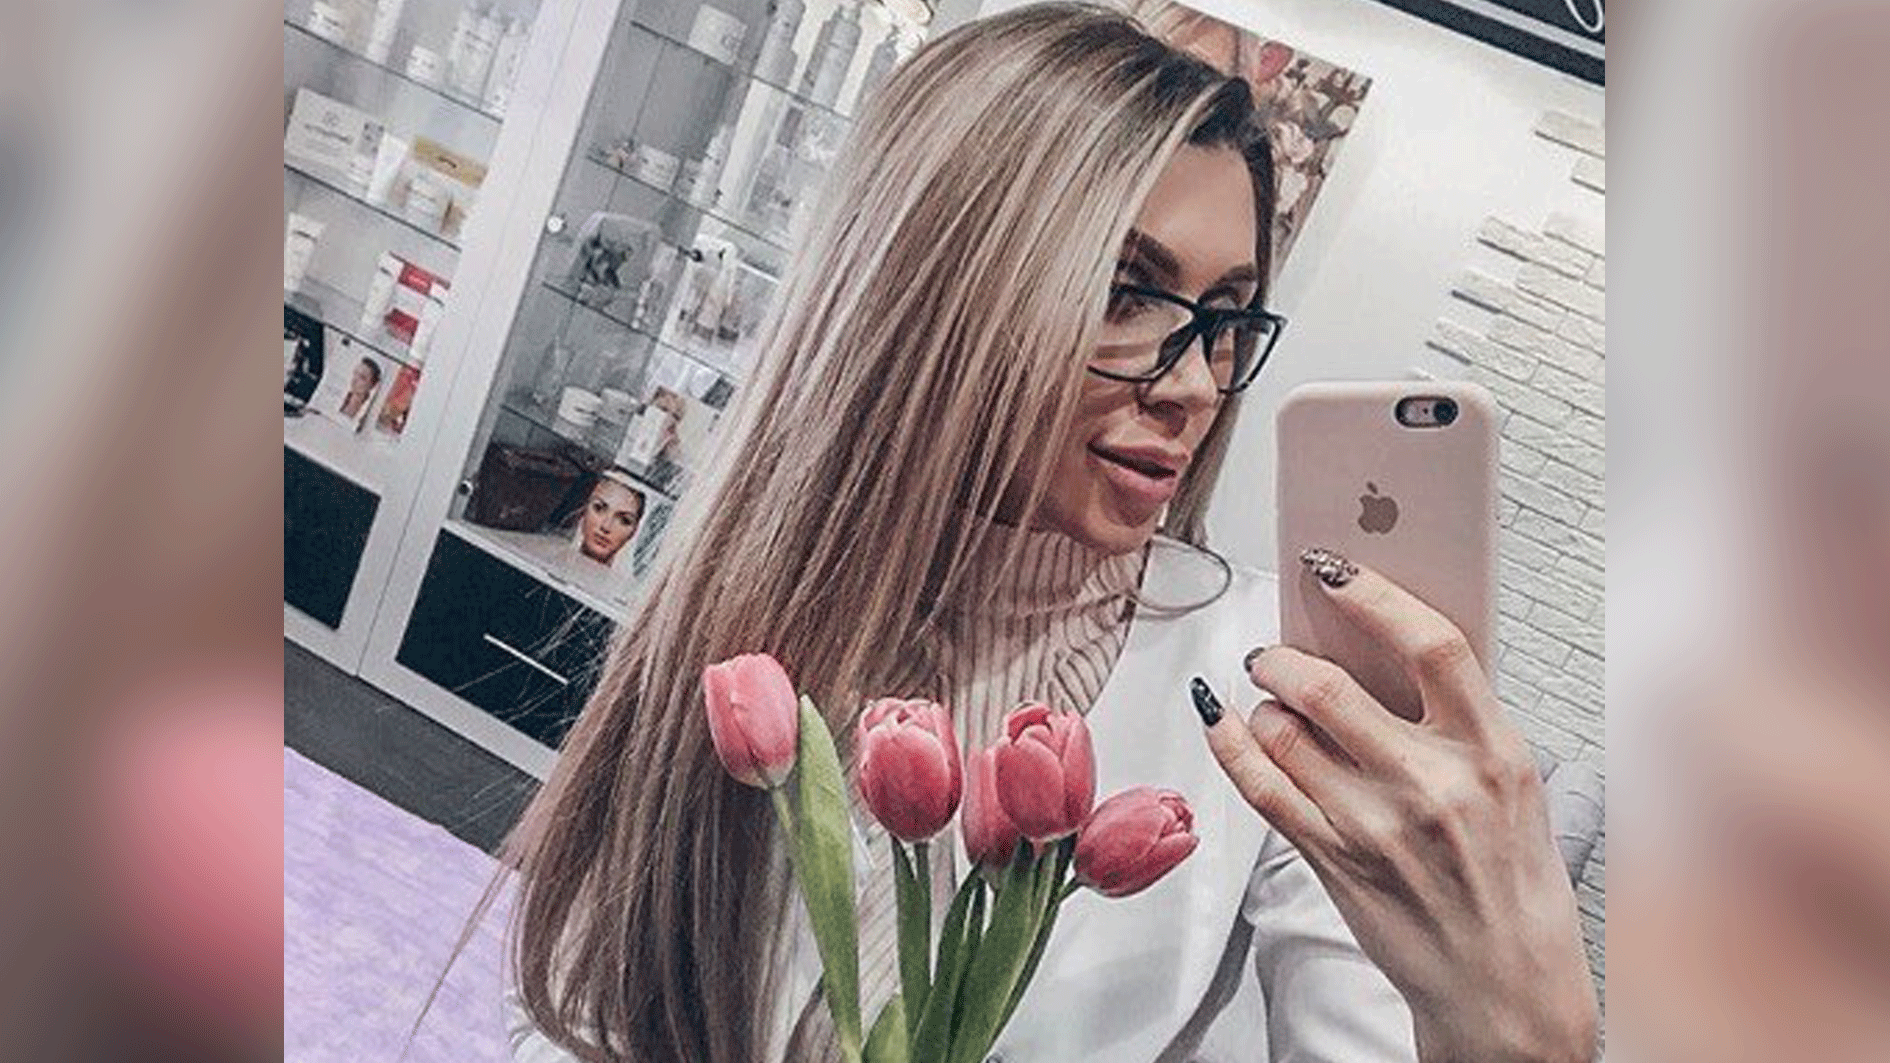 "<p>Фото © Instagram/<a href=""https://www.instagram.com/kosmetolog.magnitogorsk/"" target=""_self""><strong>kosmetolog.magnitogorsk</strong></a></p>"